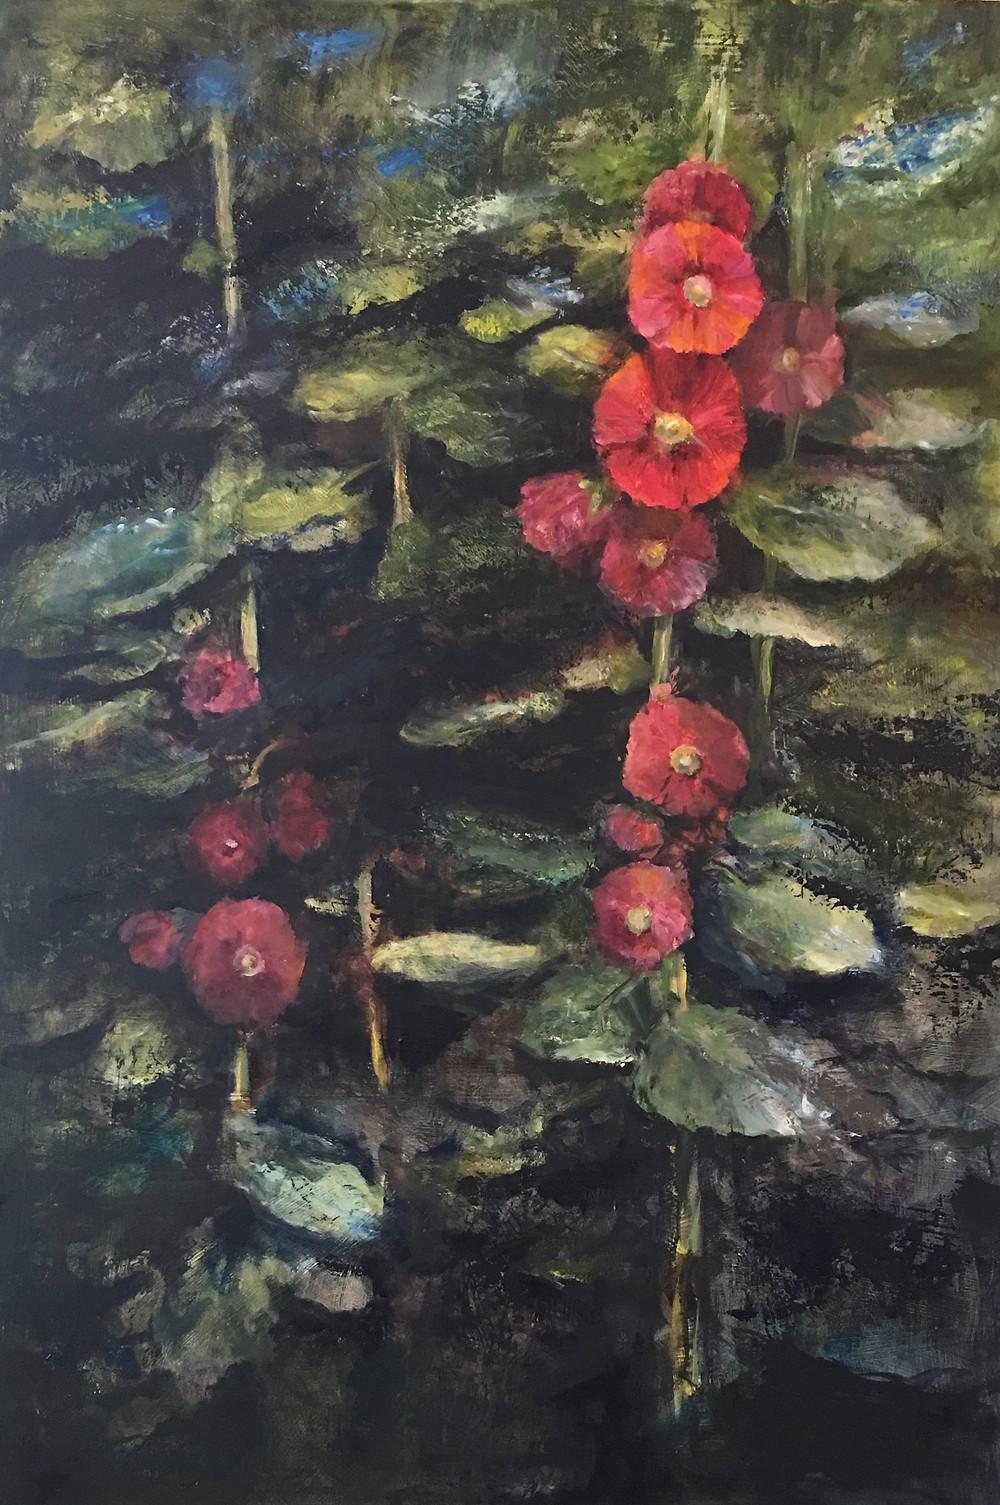 oil painting of hollyhocks by artist Julia Watson